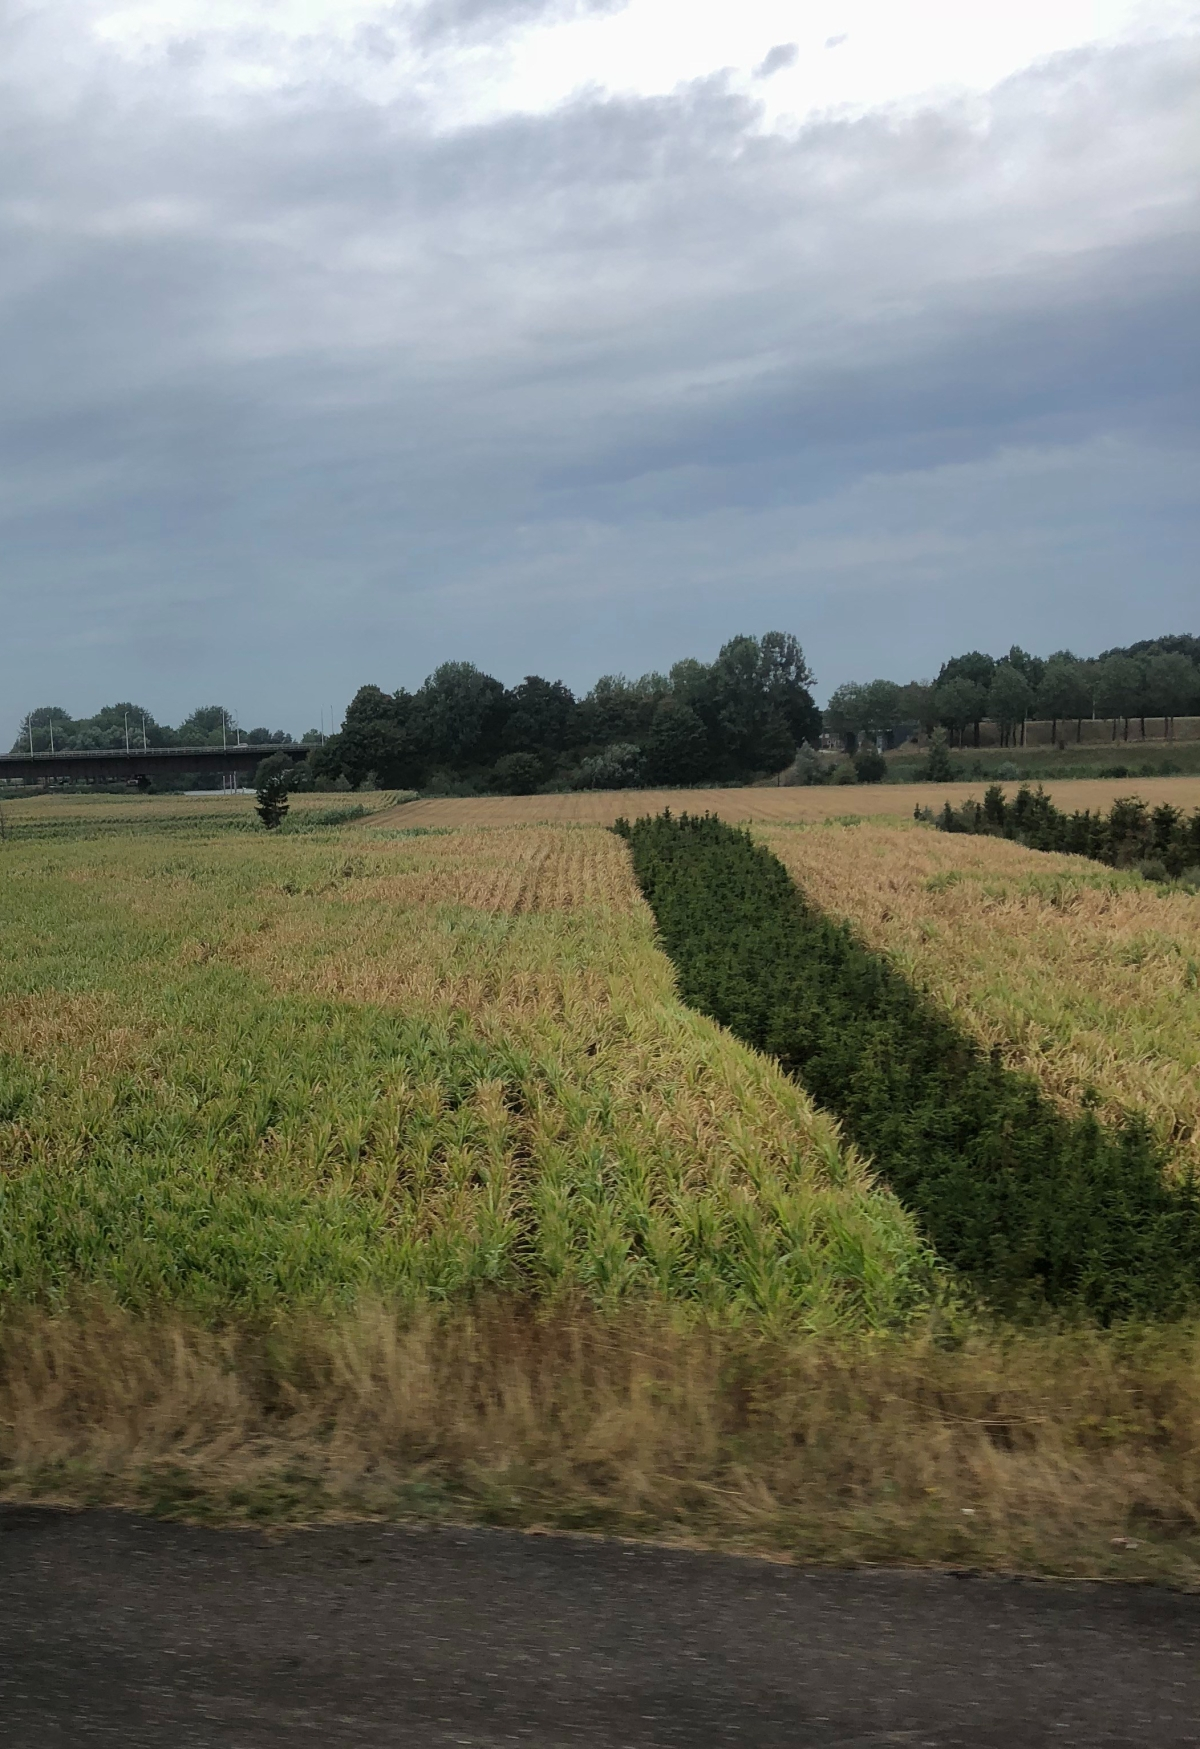 Corn field in need of water